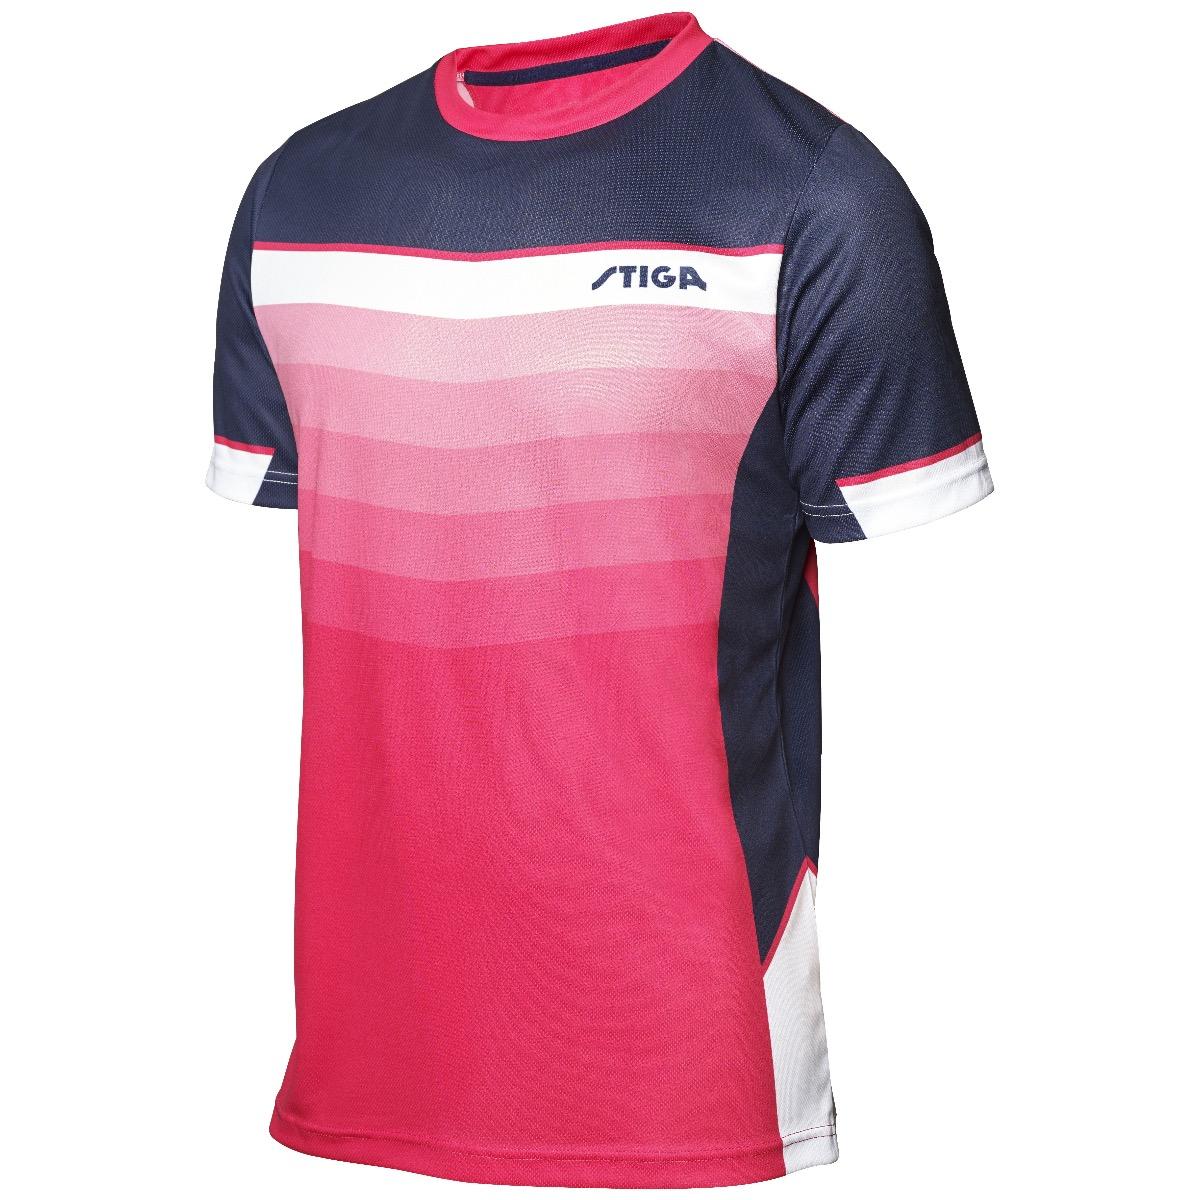 Stiga River Pink/Navy